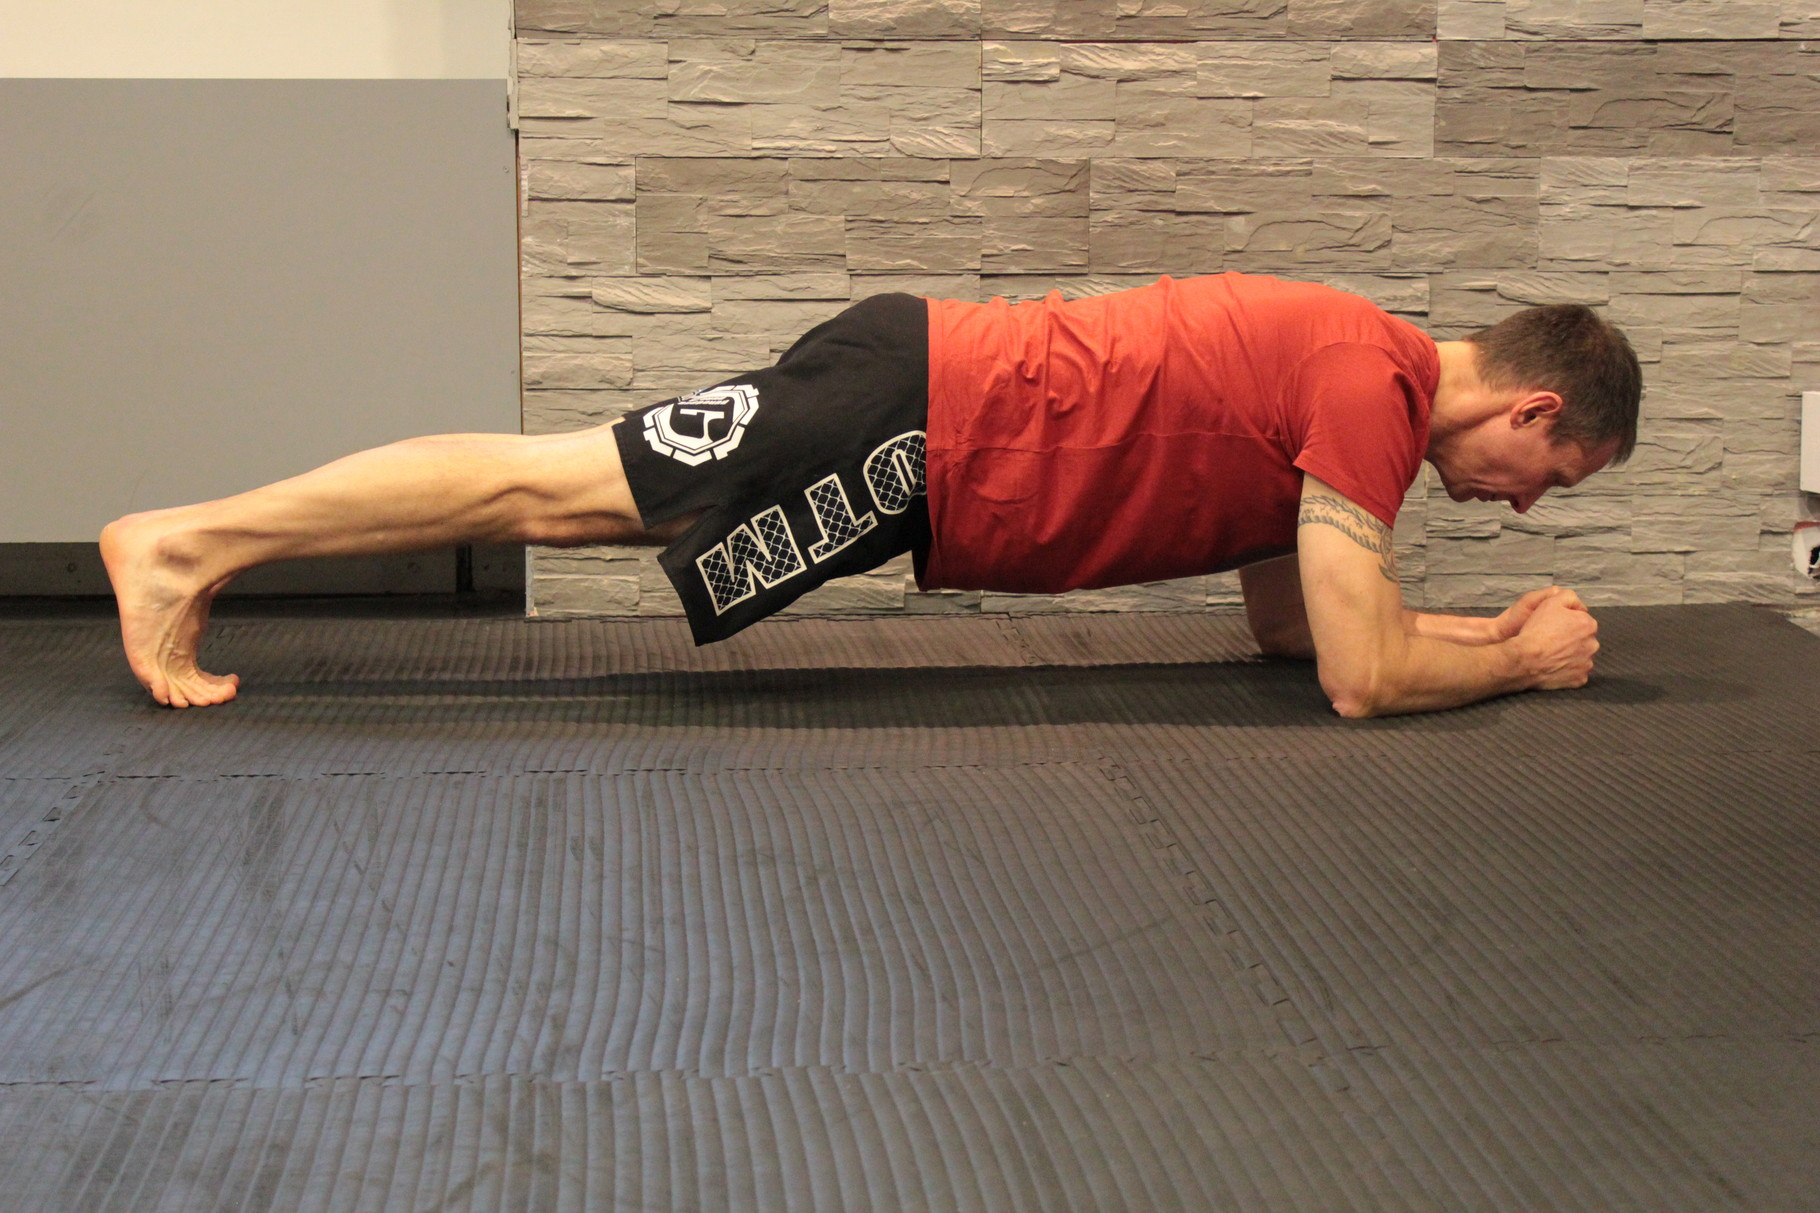 Hardstyle Plank